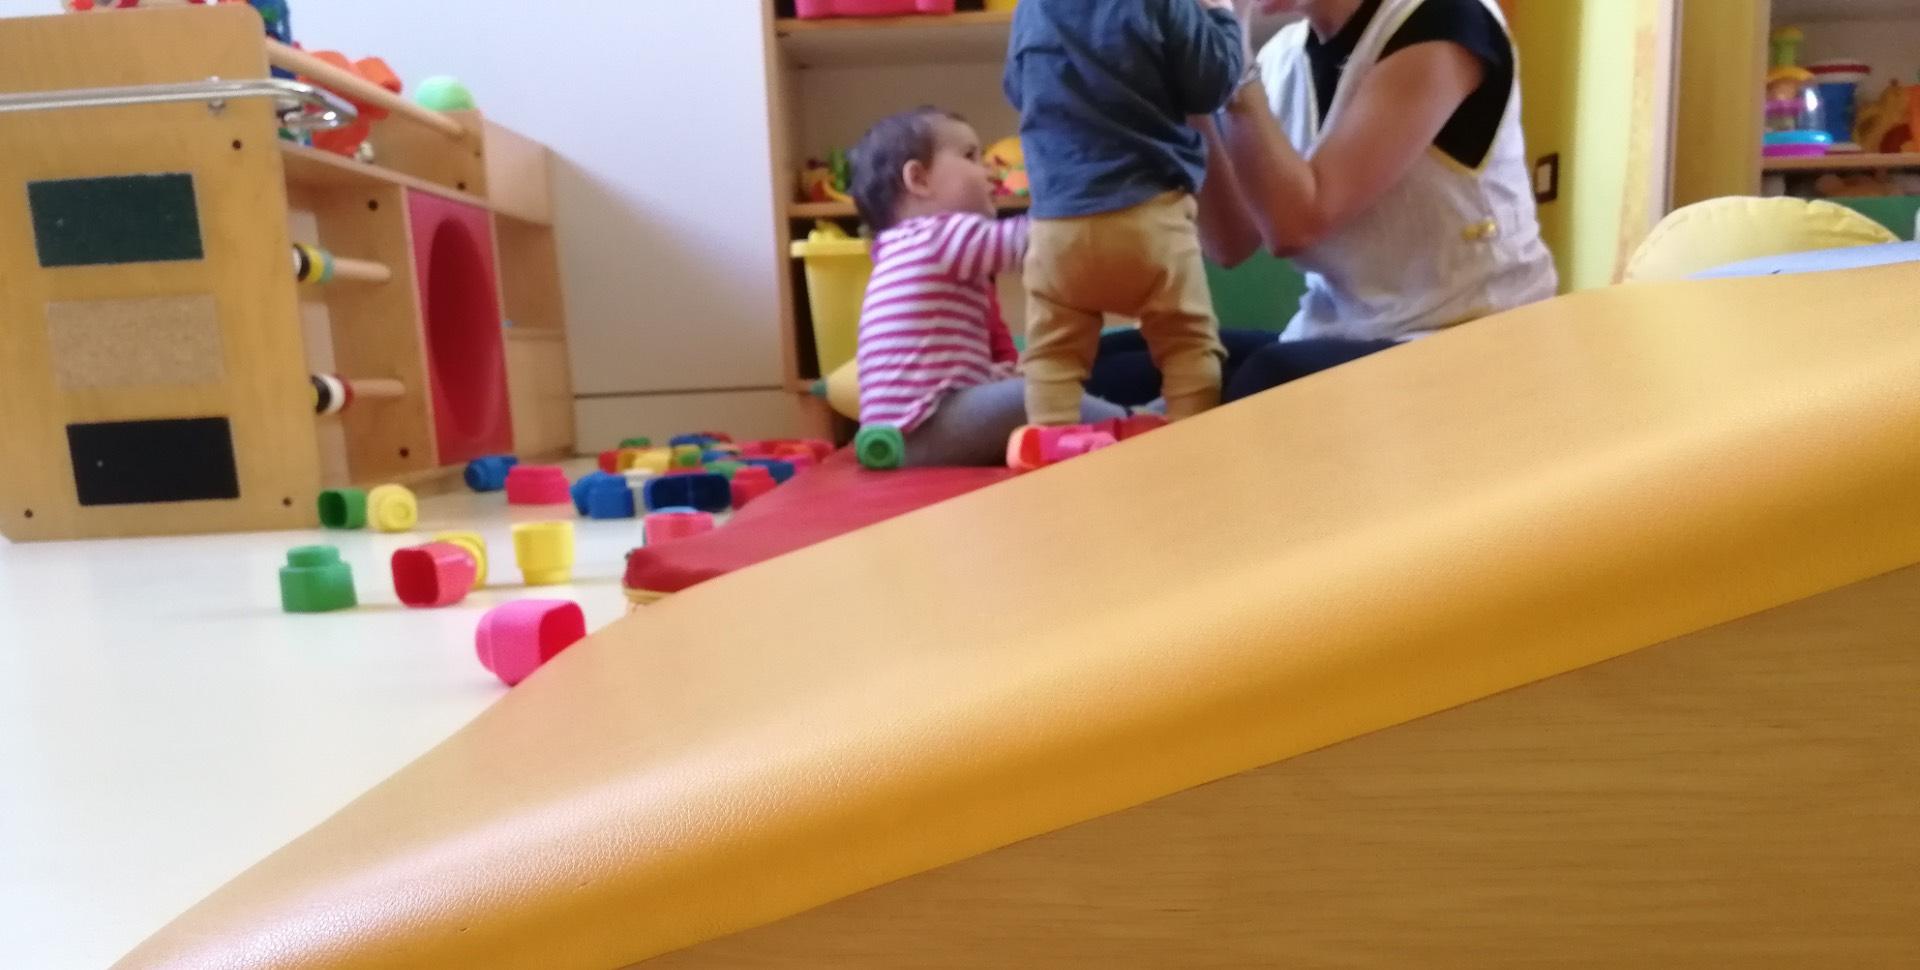 Strutture per l'infanzia